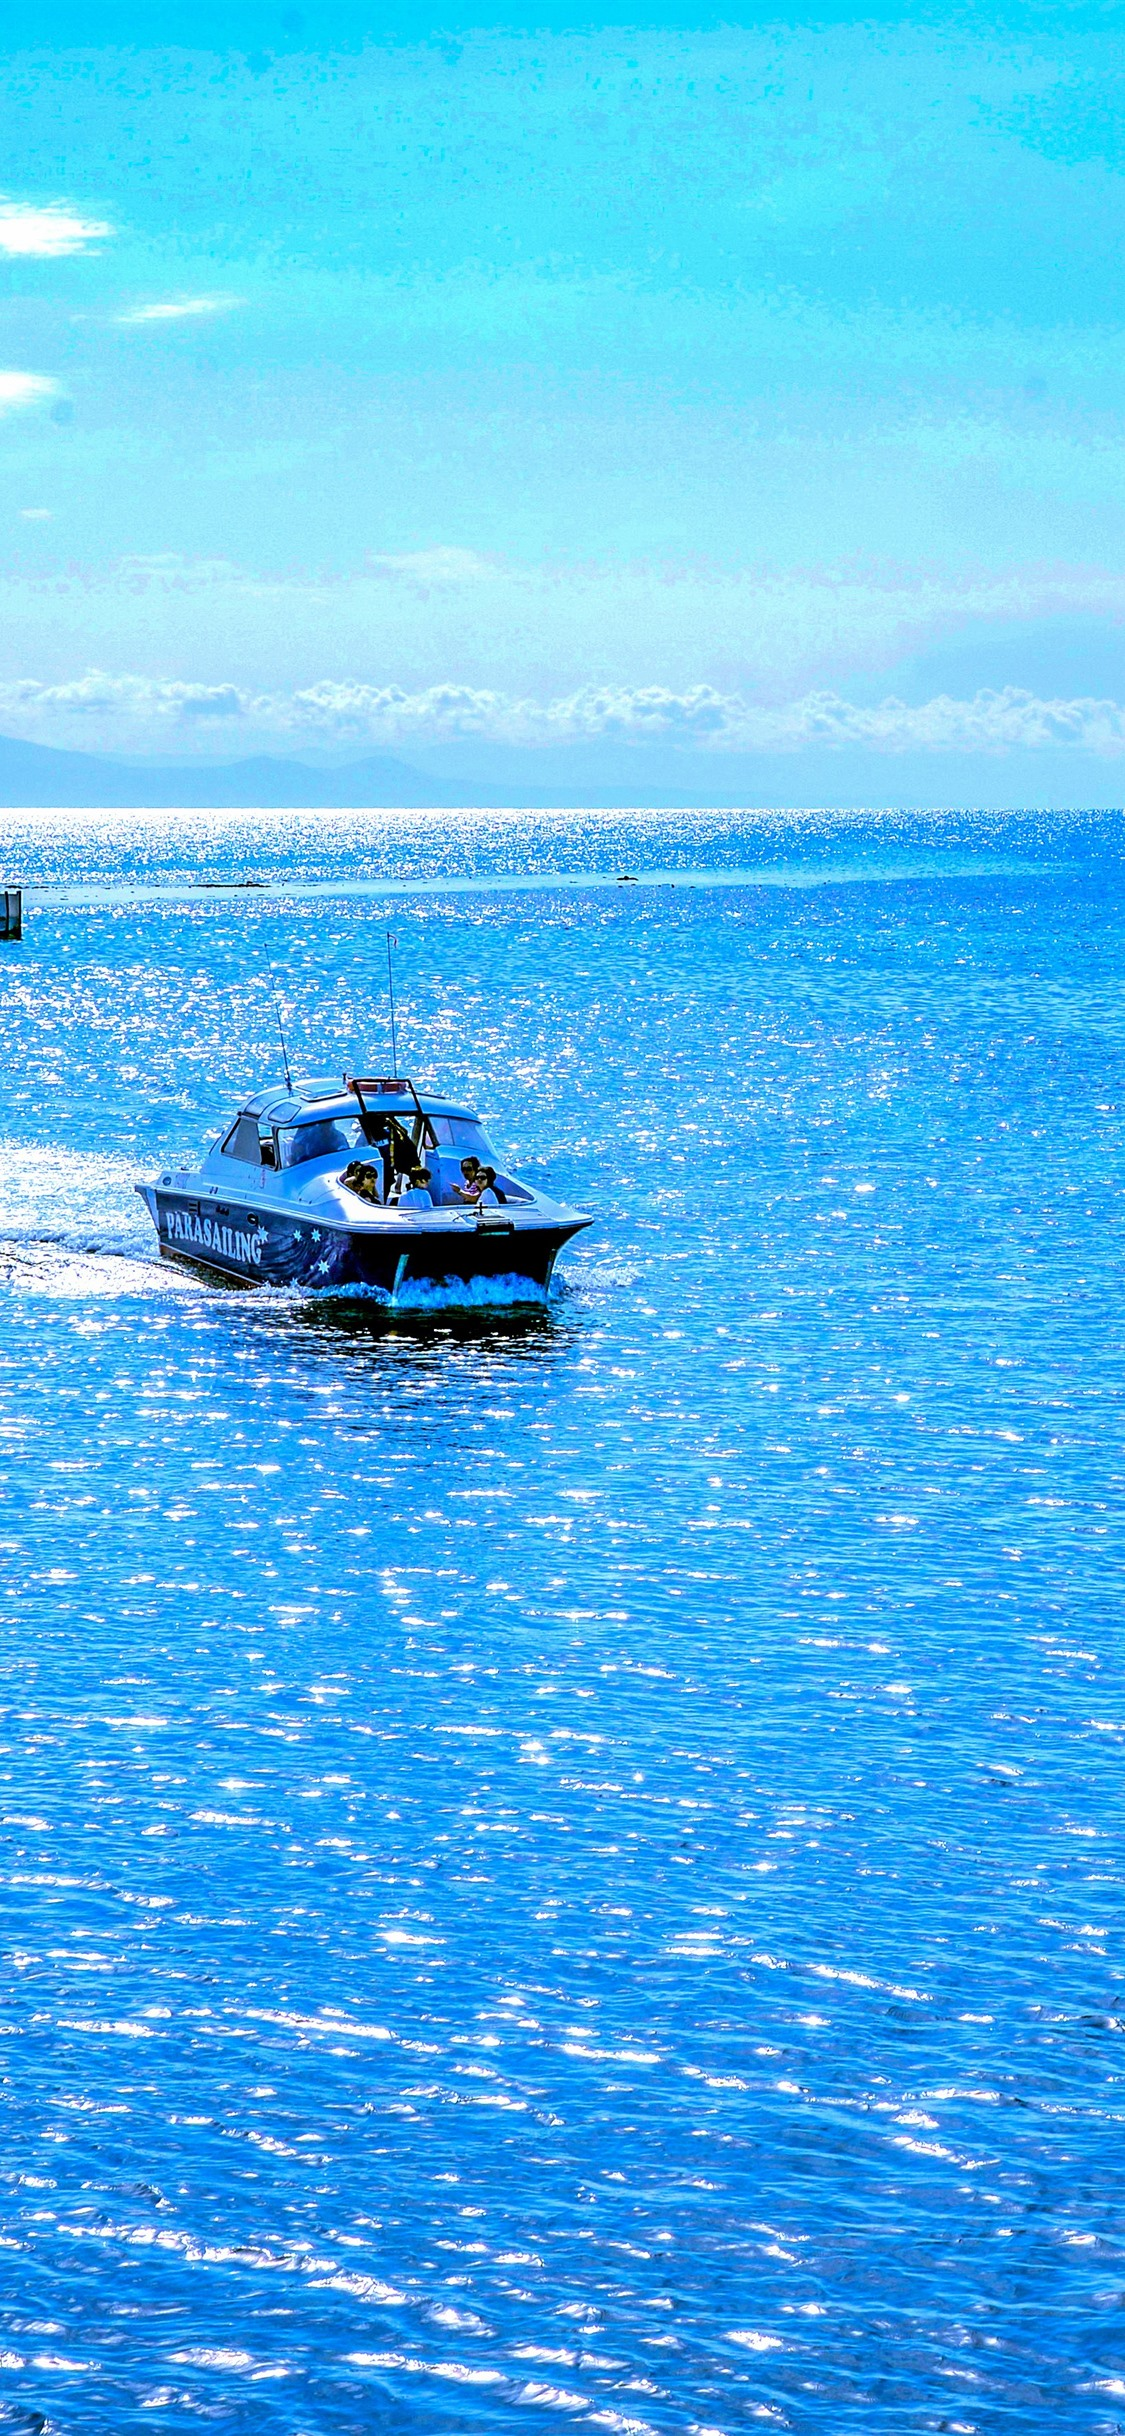 Australia Beautiful Blue Sea Boat 1242x2688 Iphone Xs Max